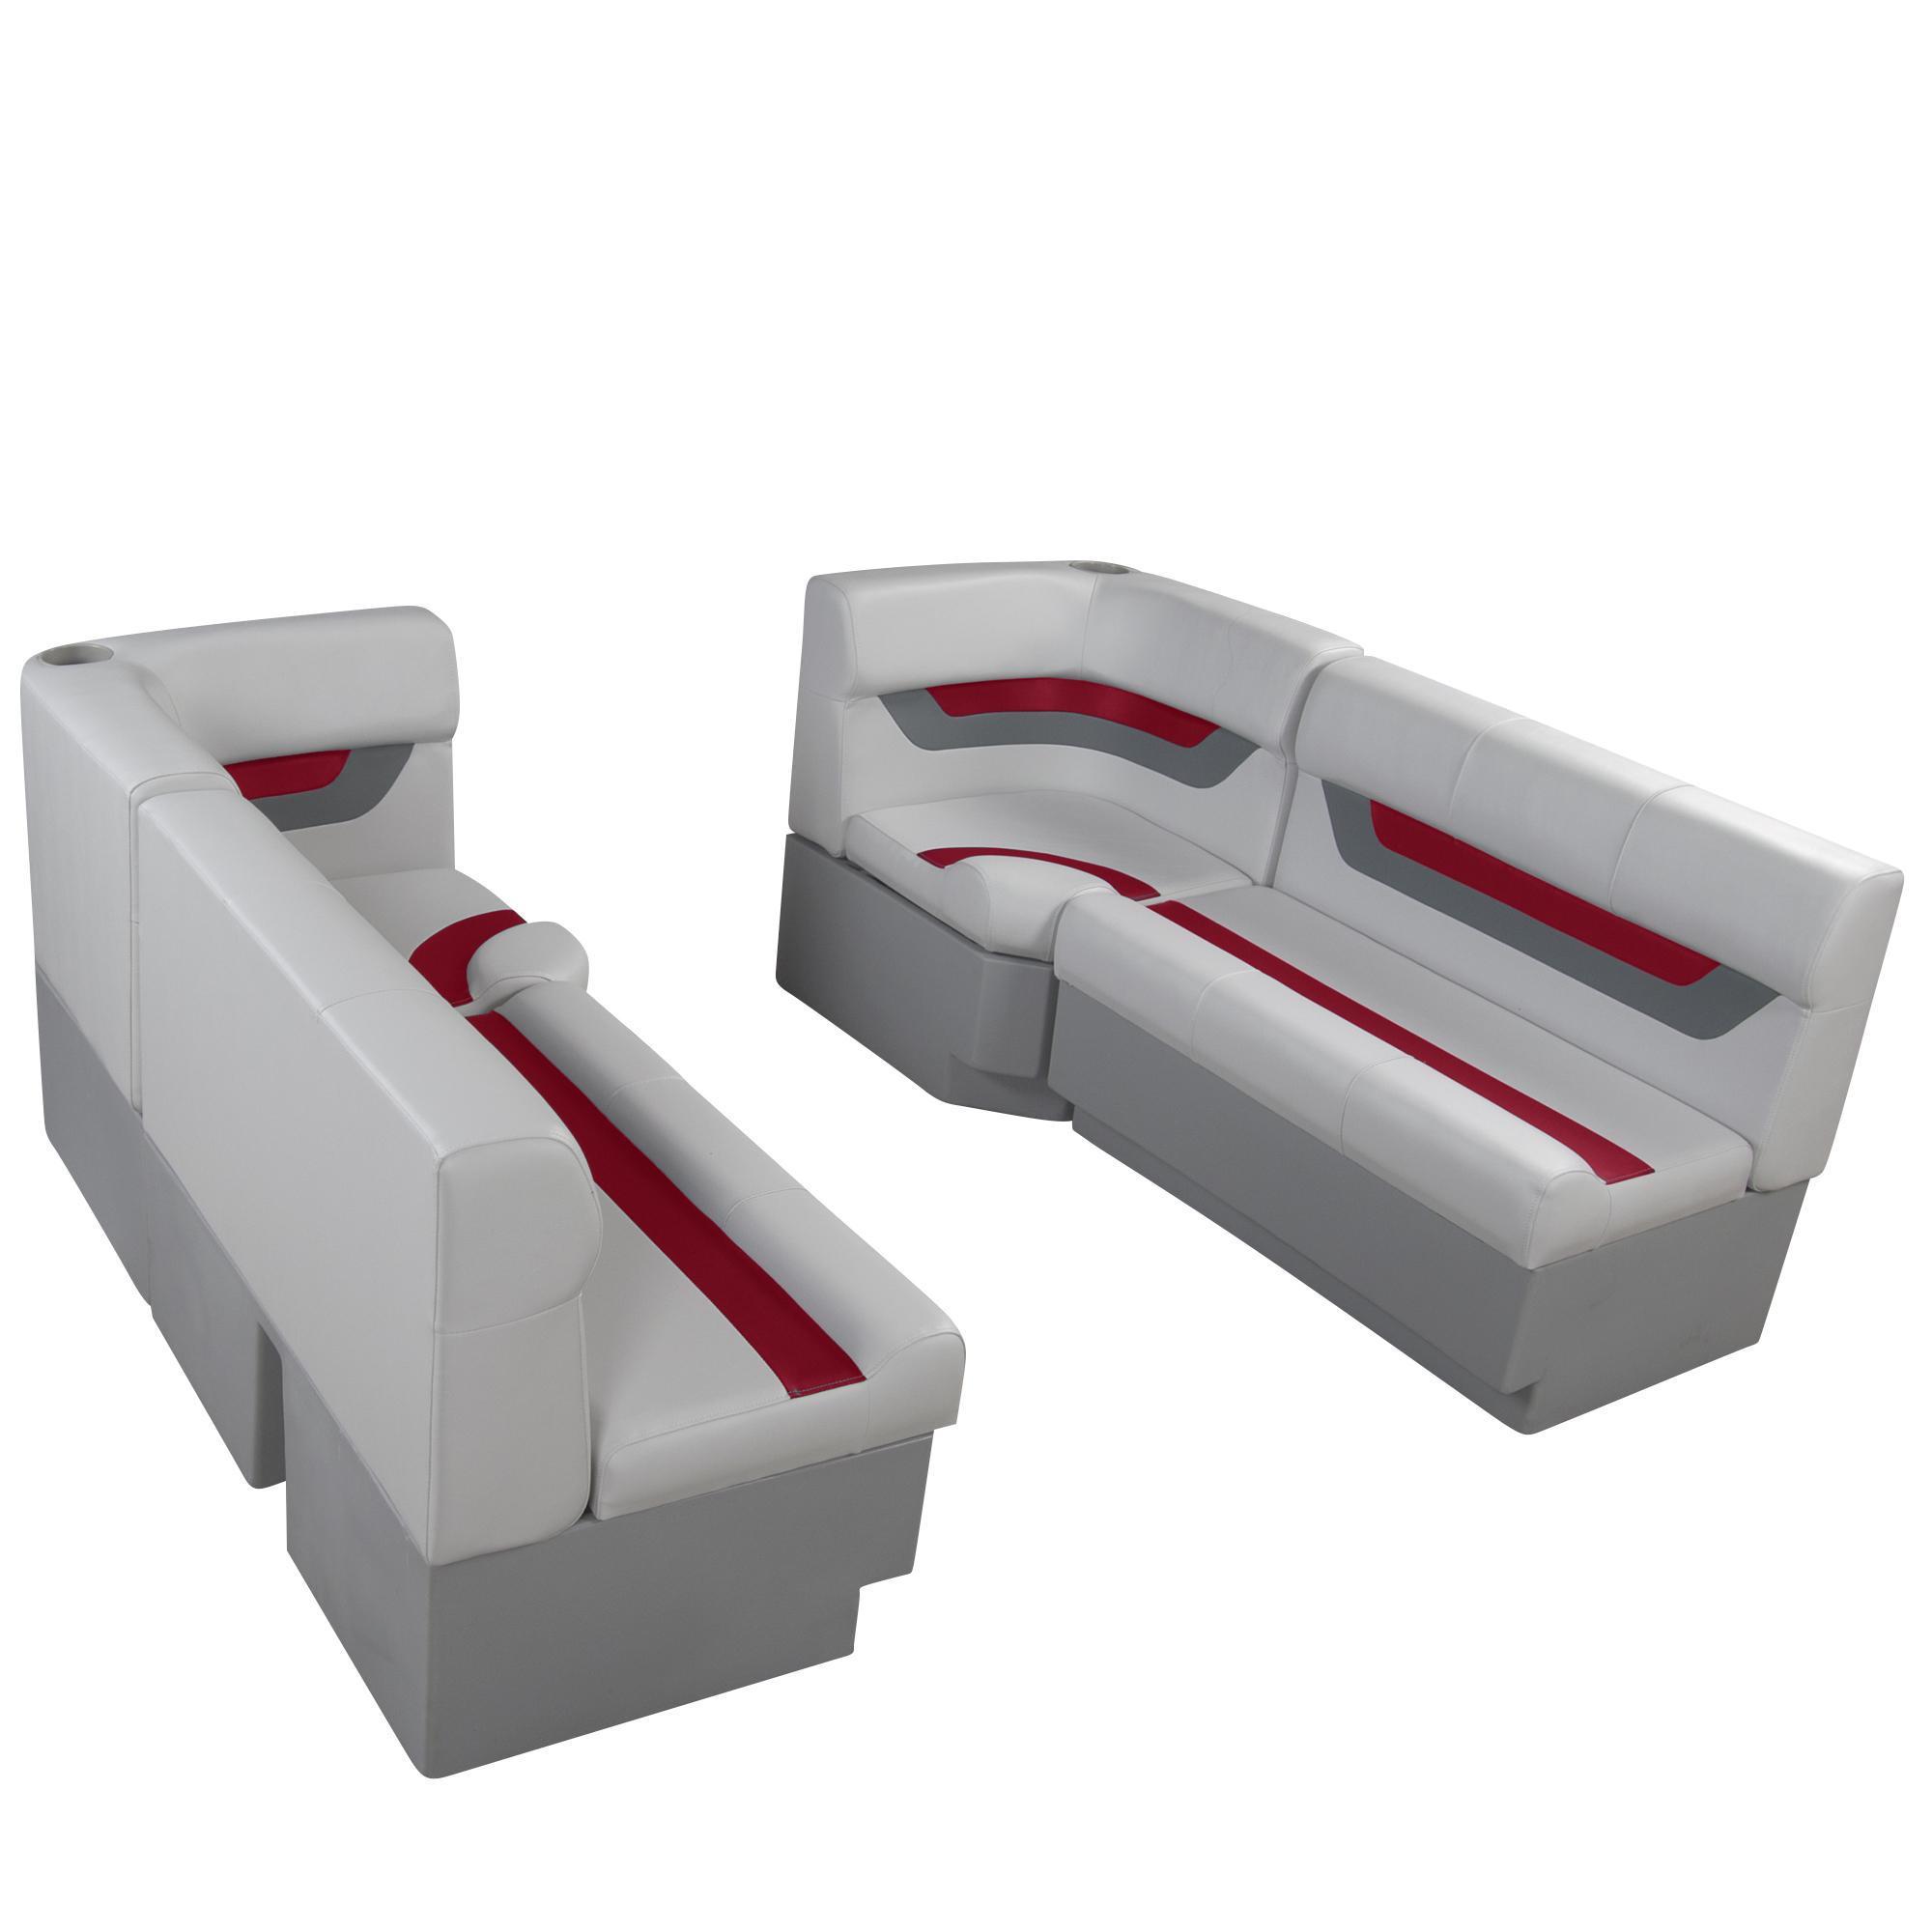 "Designer Pontoon Furniture - 61"" Front Seat Package, Sky Gray/Dark Red"